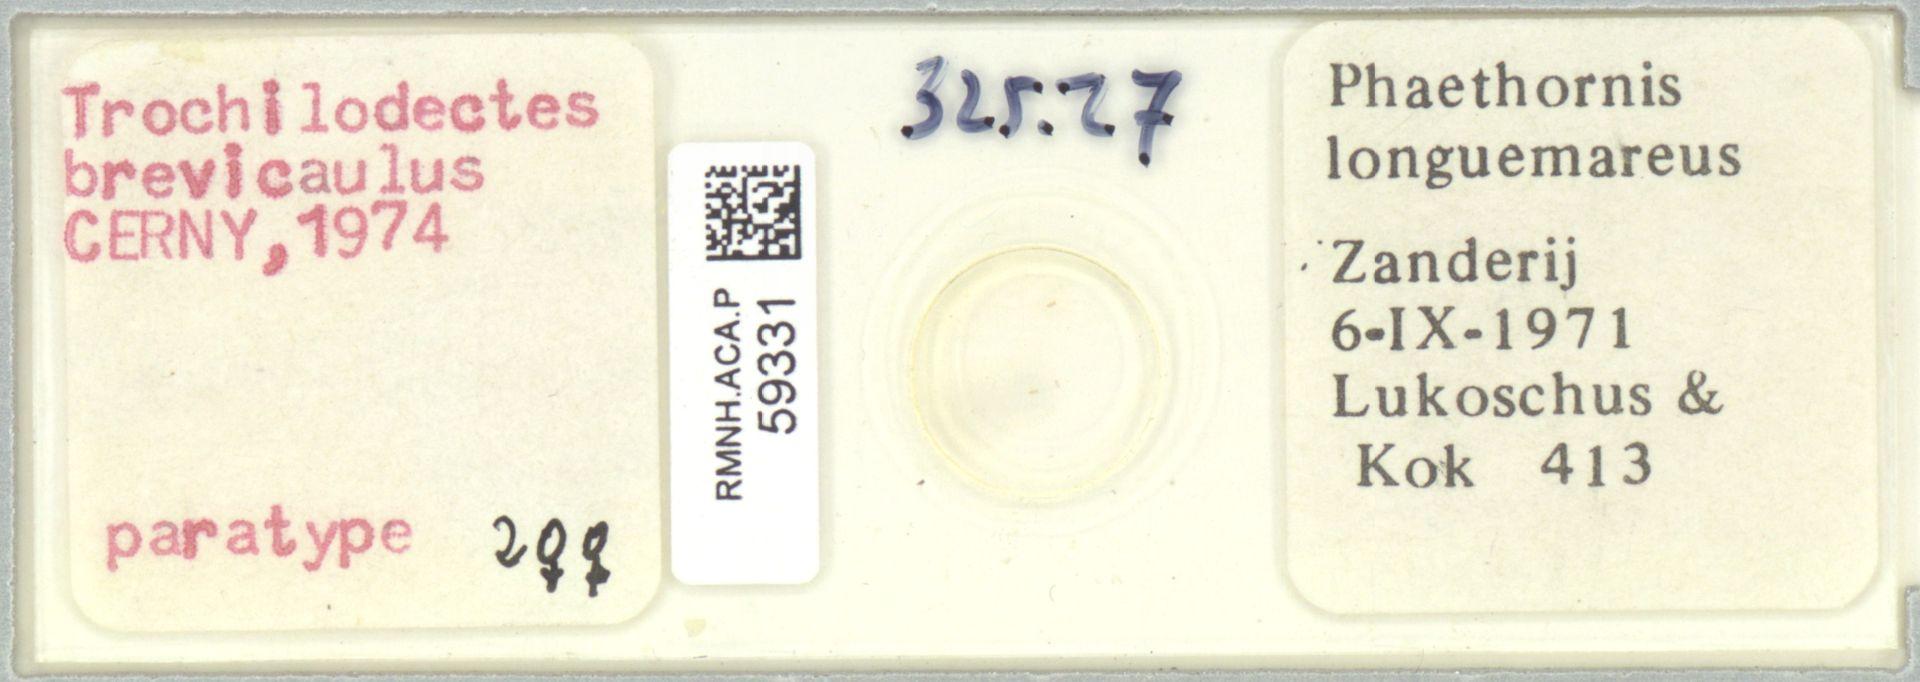 RMNH.ACA.P.59331 | Trochilodectes brevicaulus Cerny, 1974